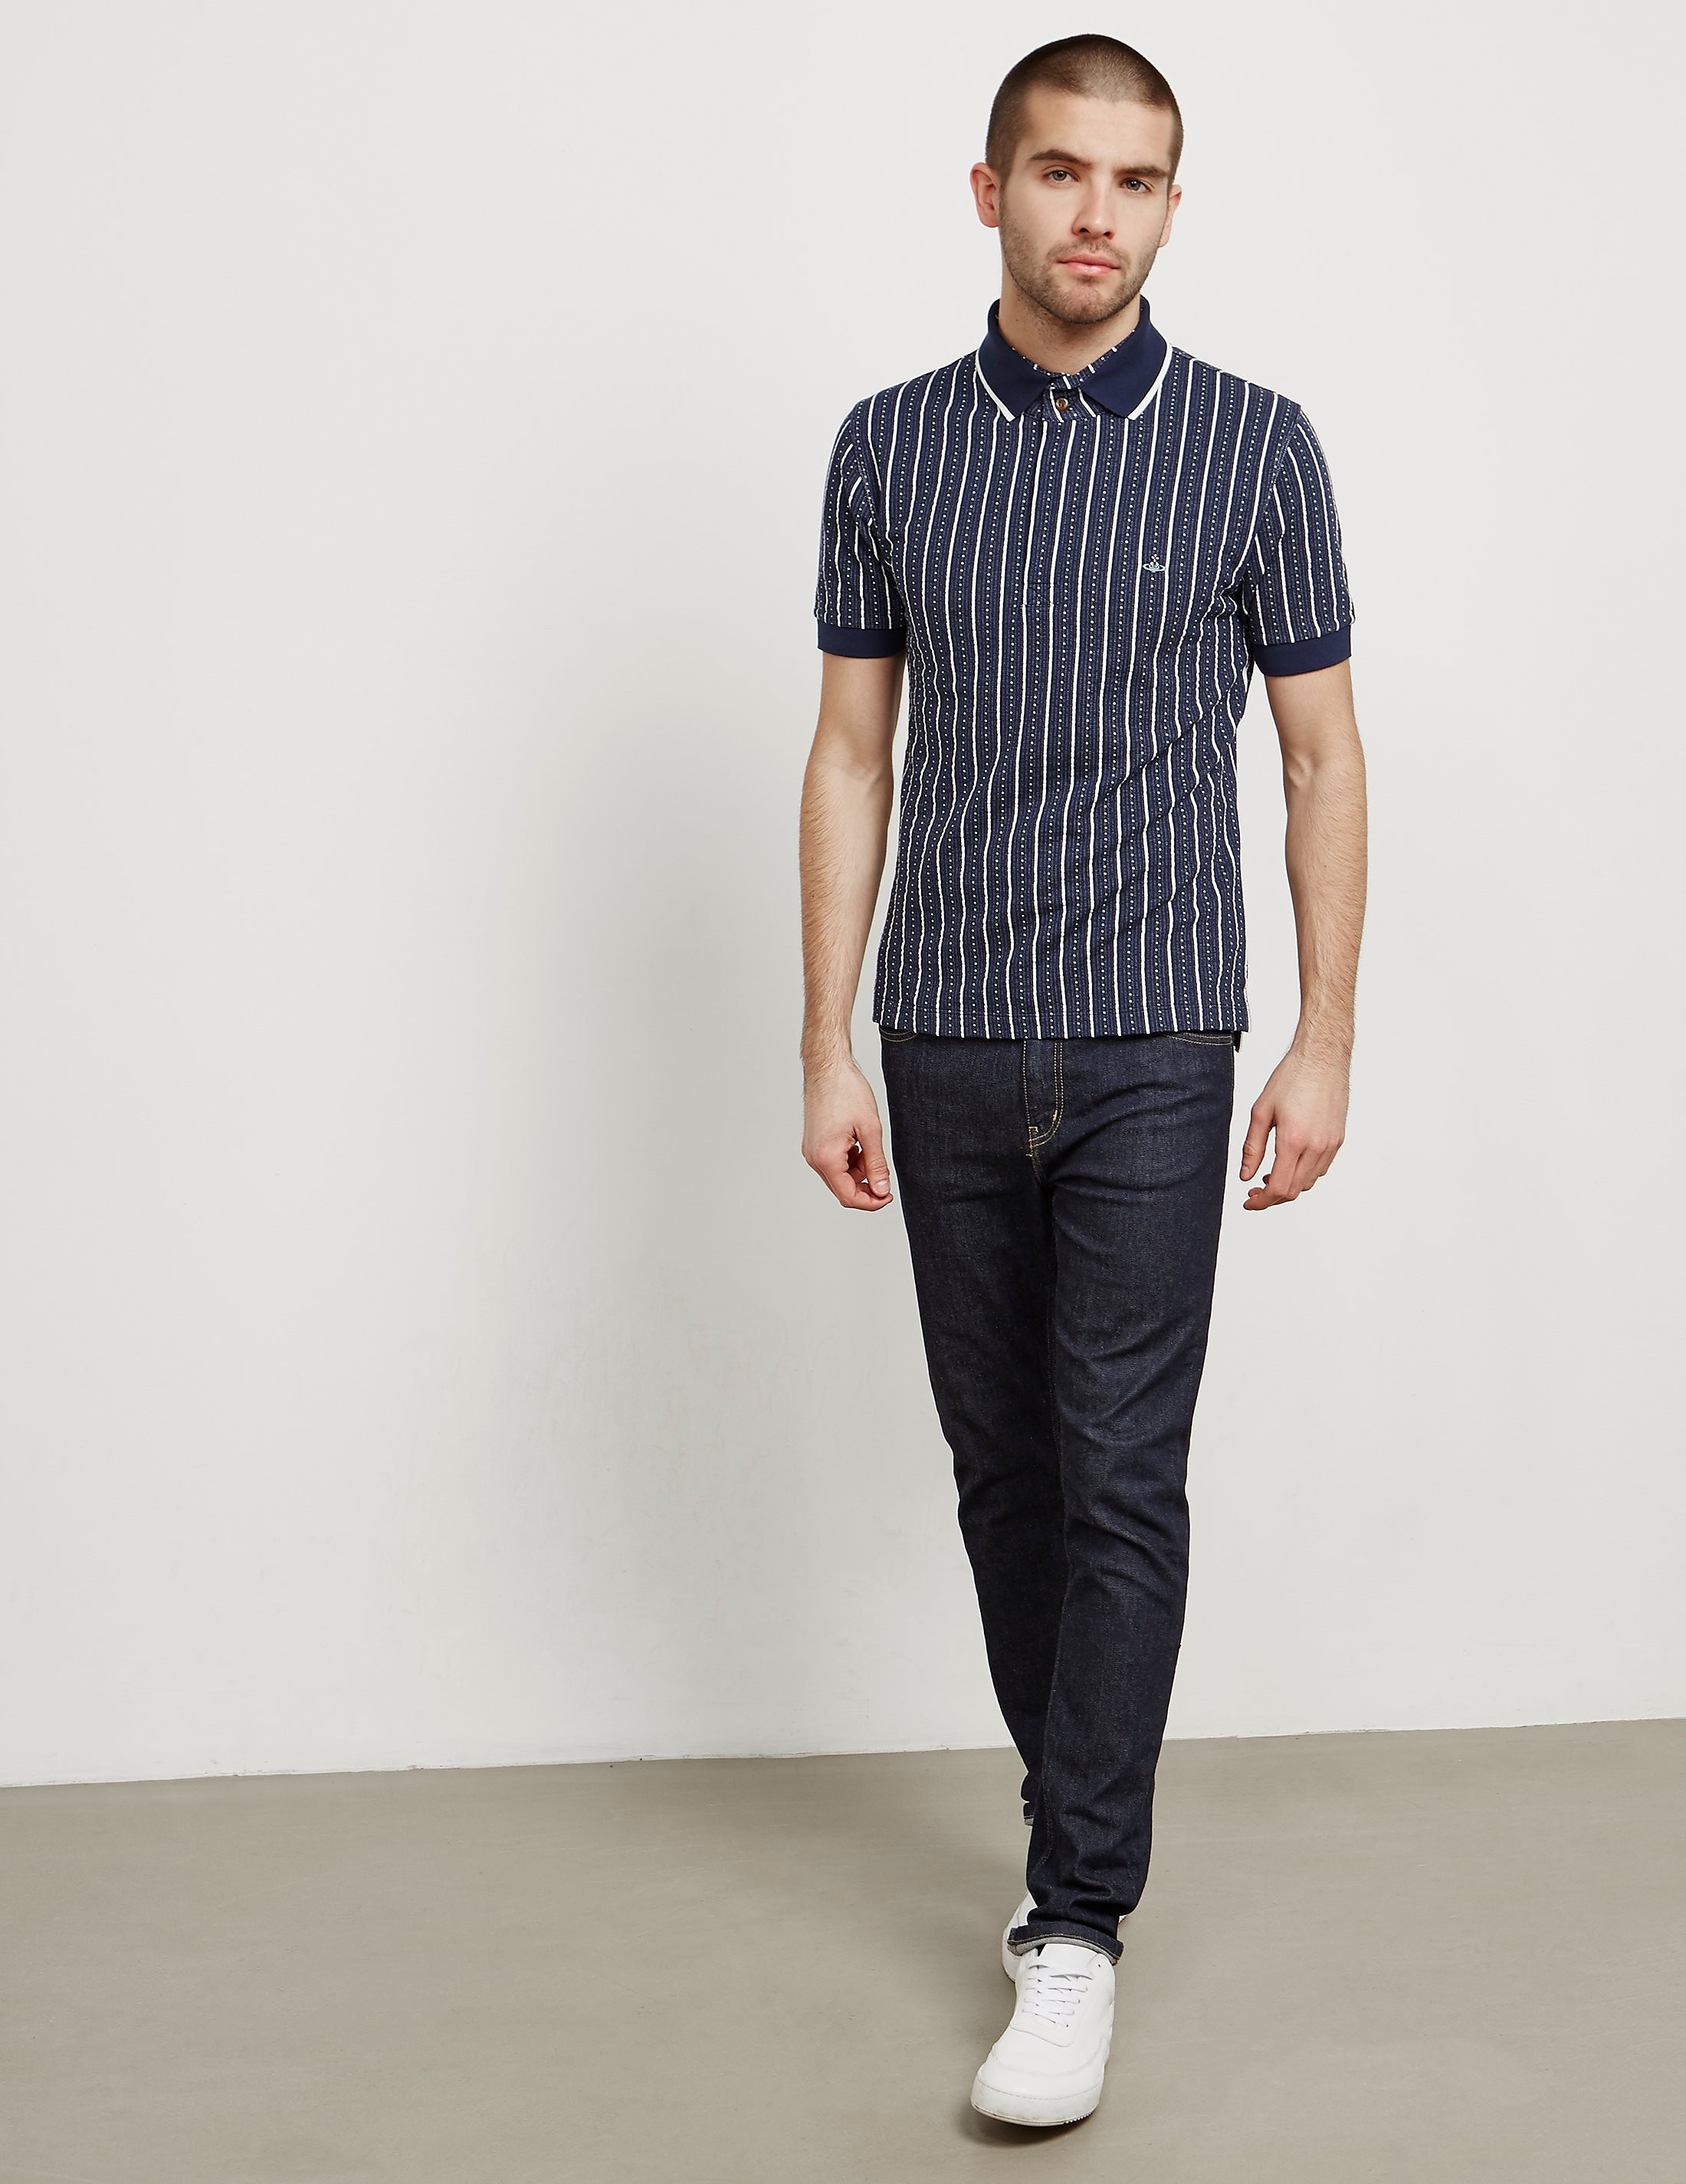 Vivienne Westwood Jacquard Orb Short Sleeve Polo Shirt